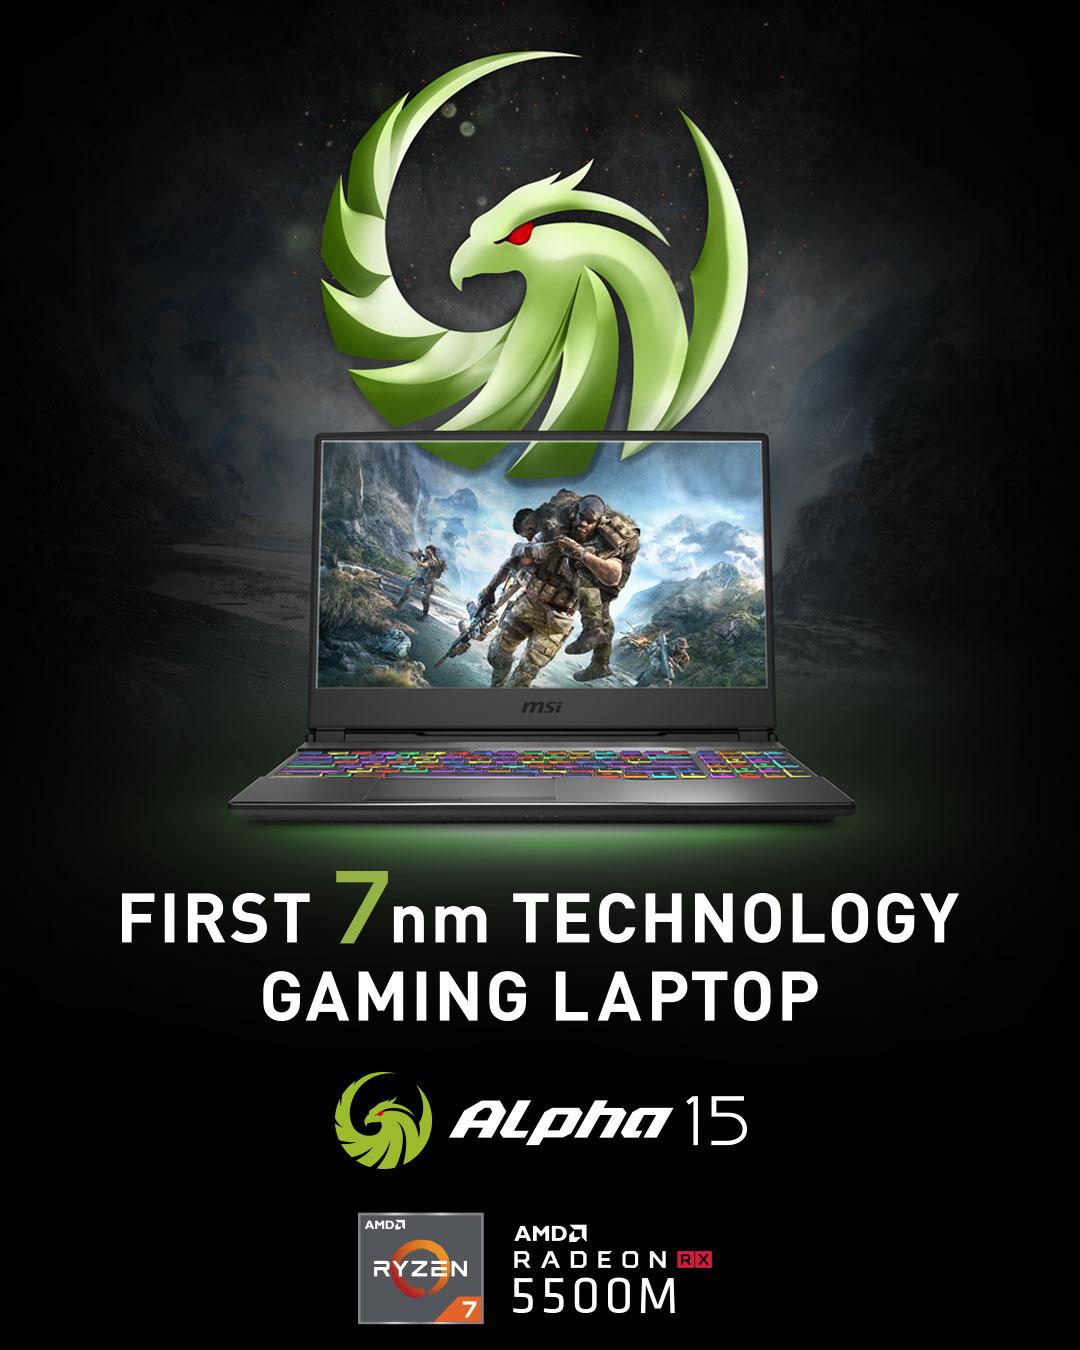 Alpha 15